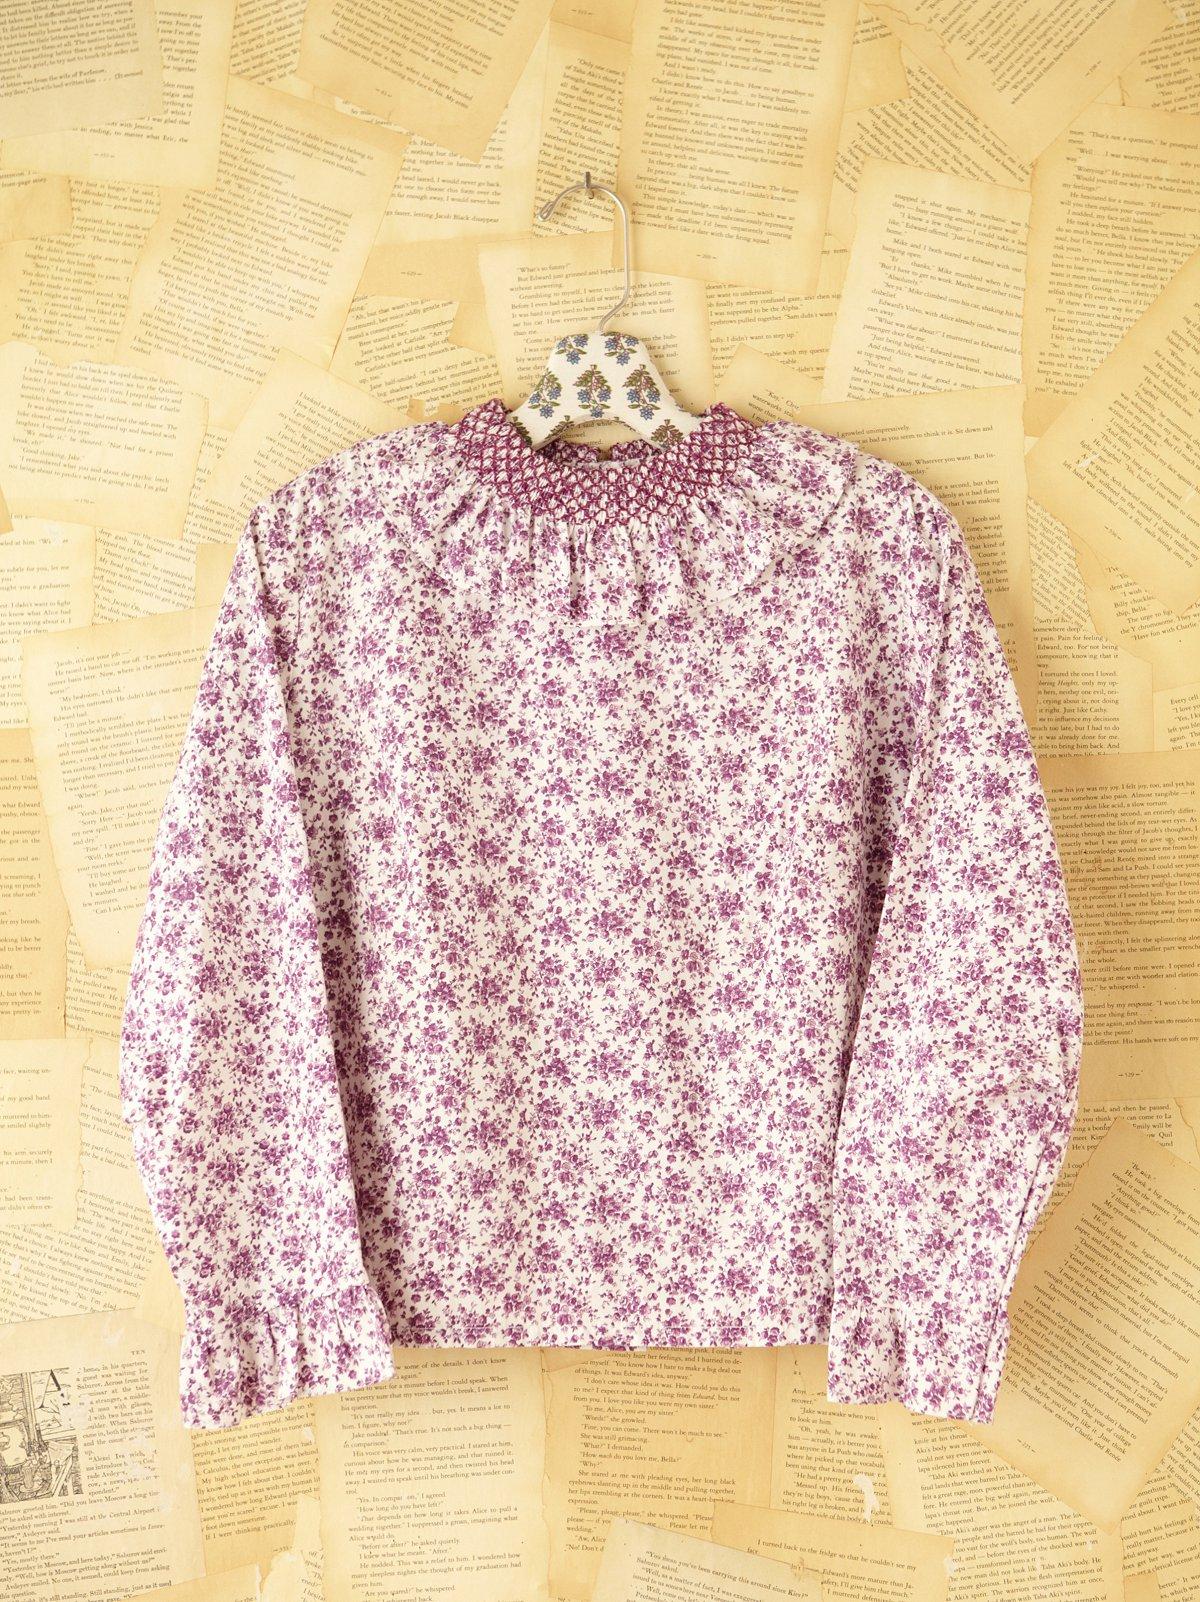 Vintage Ditzy Floral Shirt